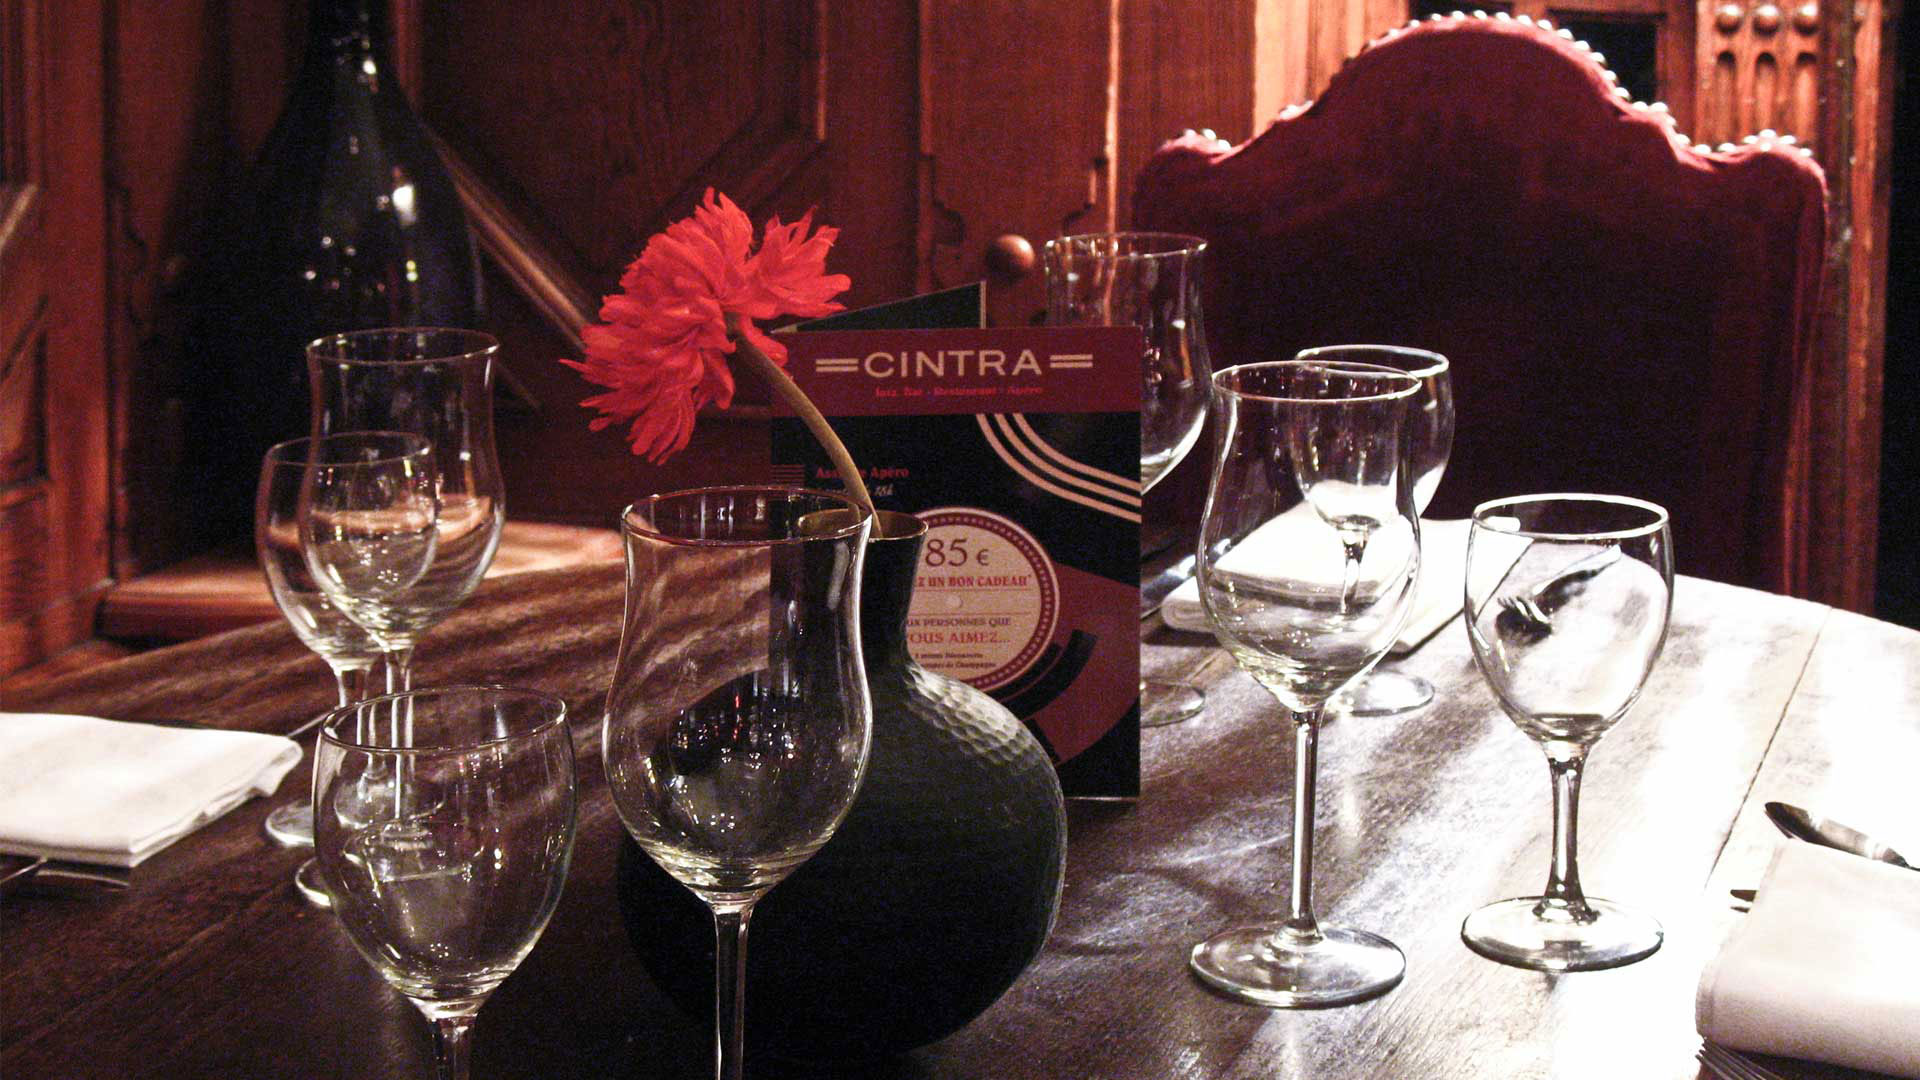 Le Cintra - Restaurant Piano Bar